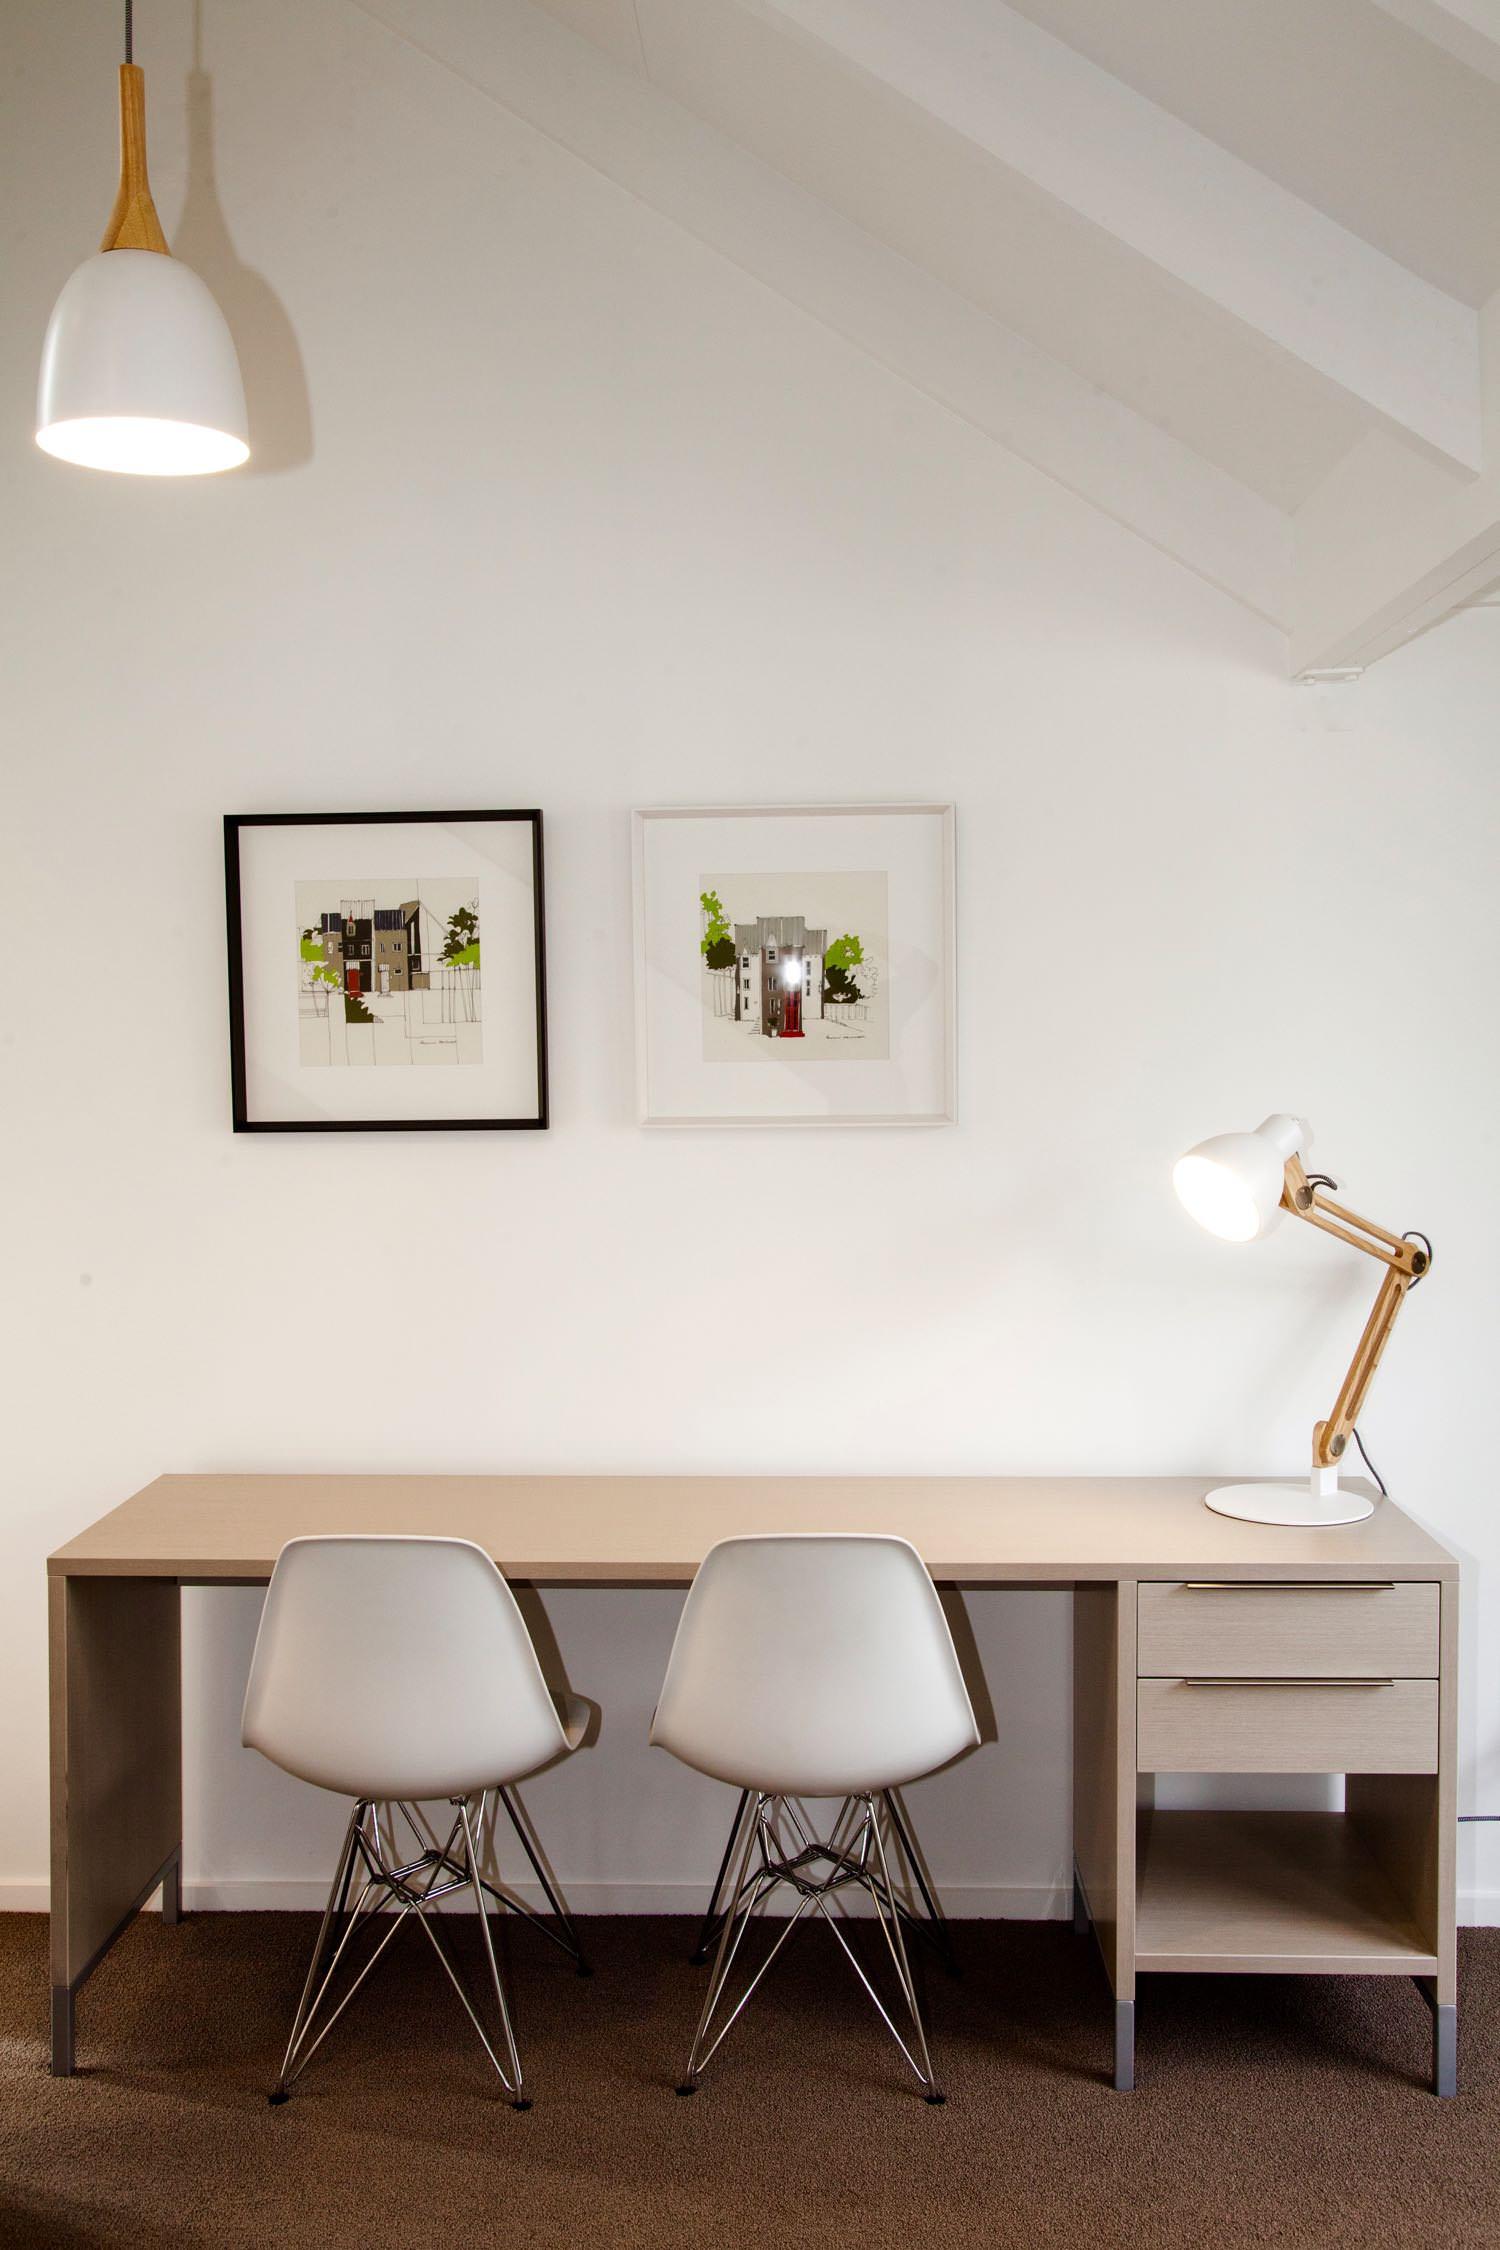 mezzanine - king desk